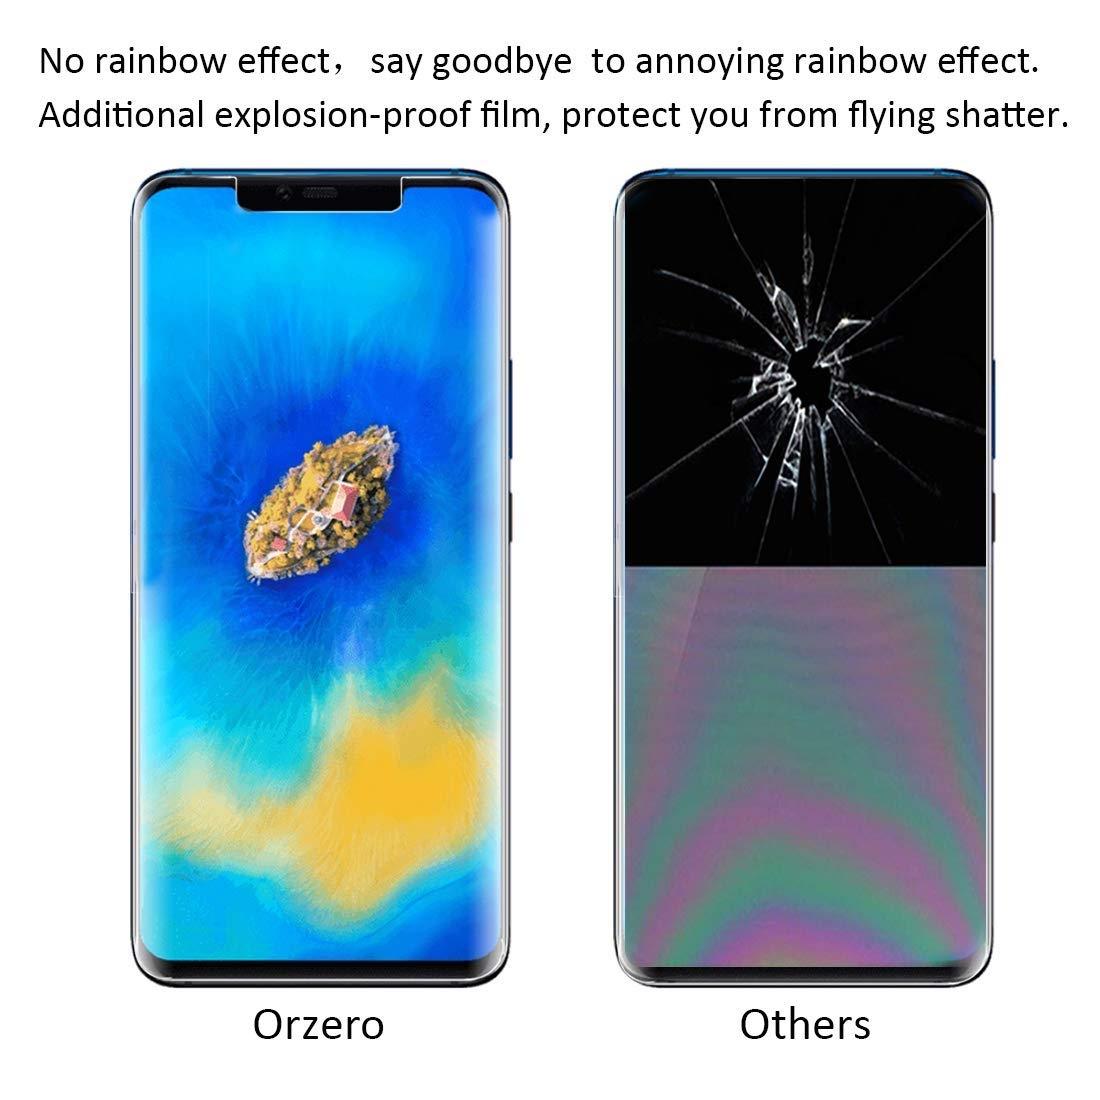 Orzero Huawei Mate 20 Pro Ekran Koruyucu (3Adet)